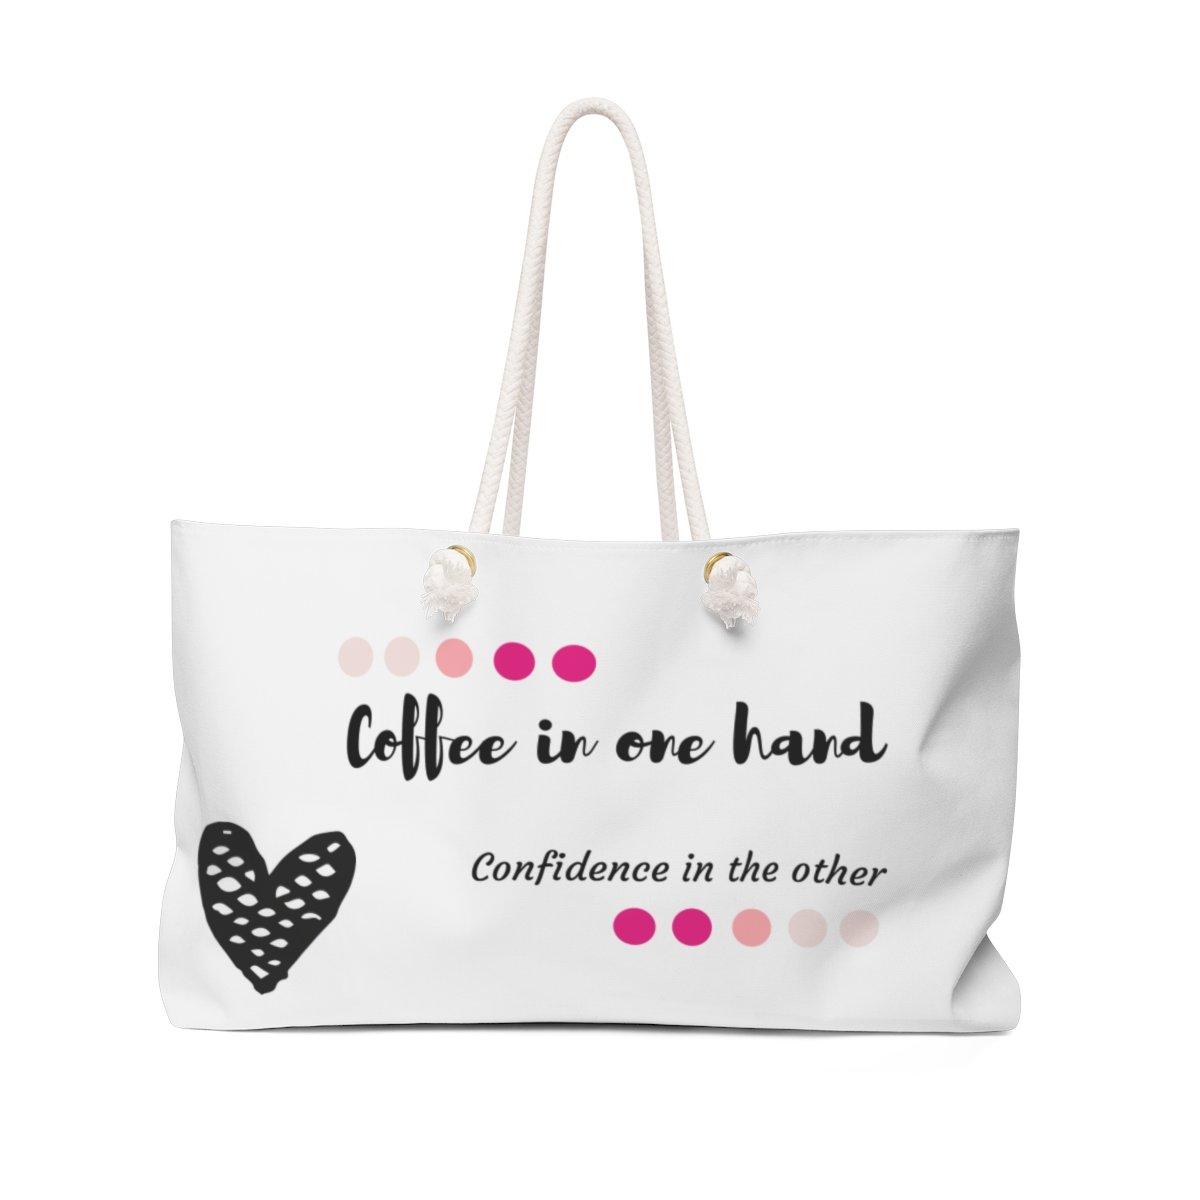 Pink Handbags Purses Bebe